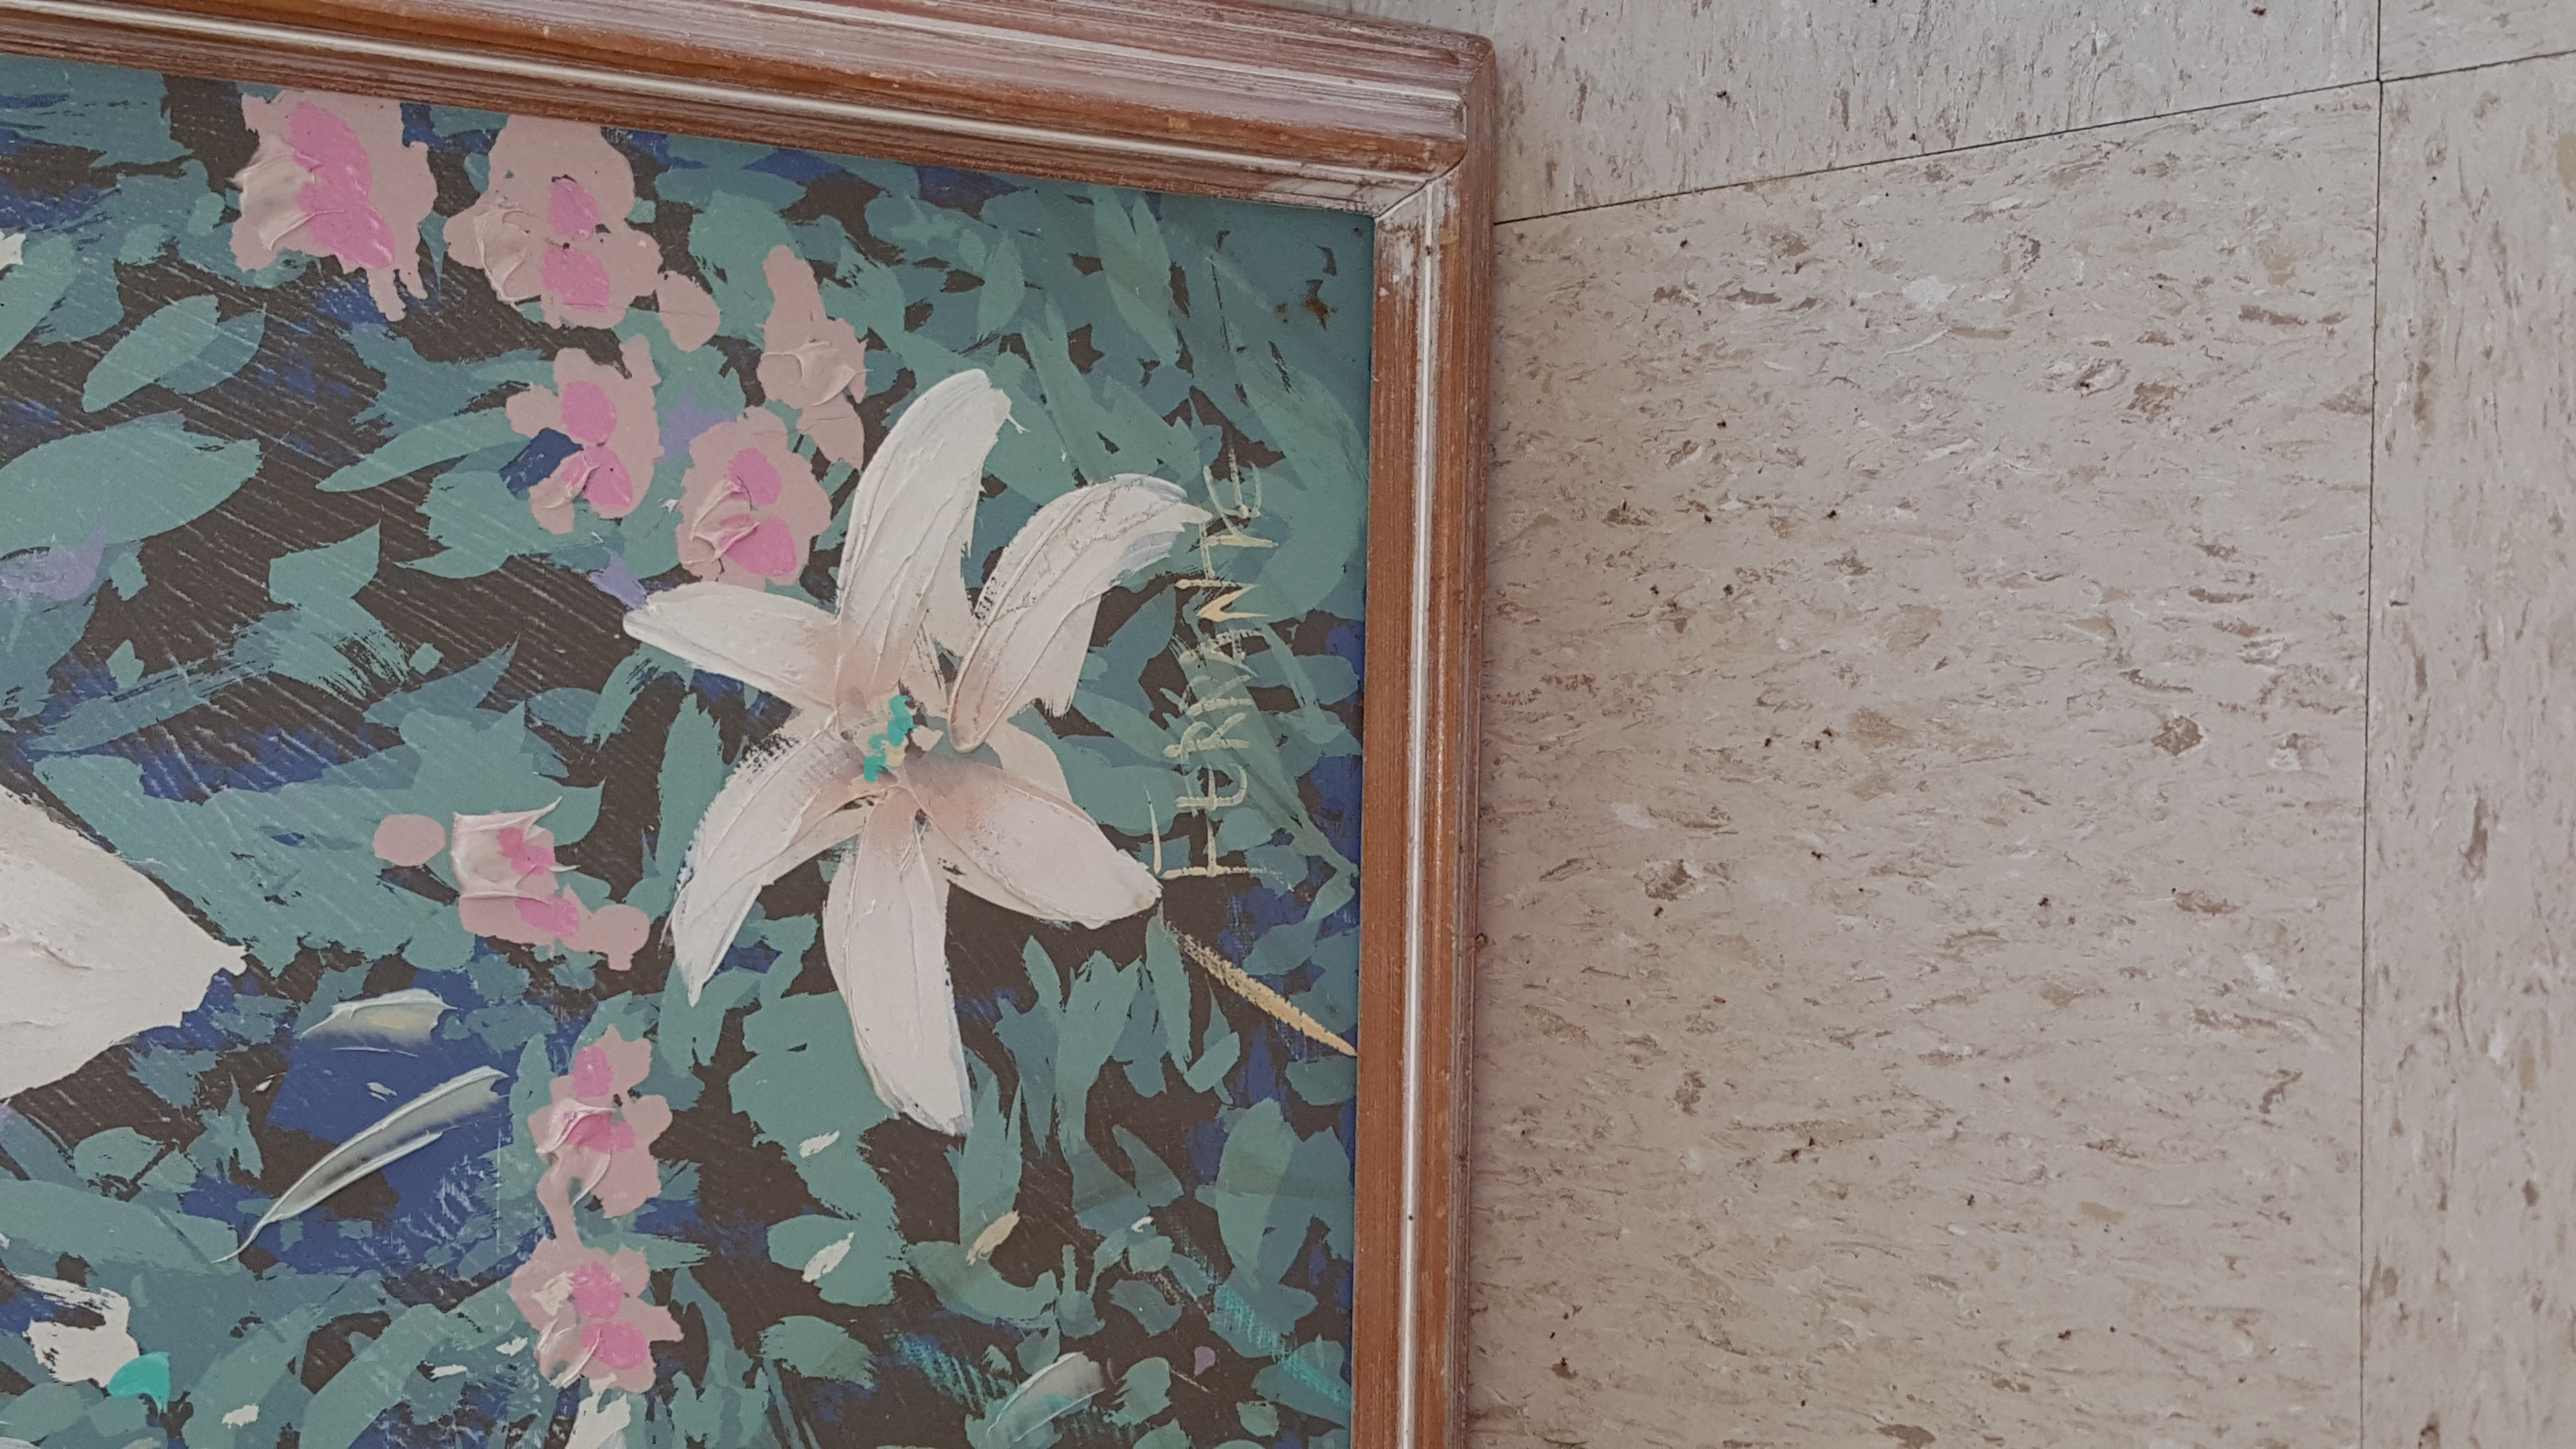 \\amerigas.com\amg\private\ballardj\My Pictures\painting.jpg